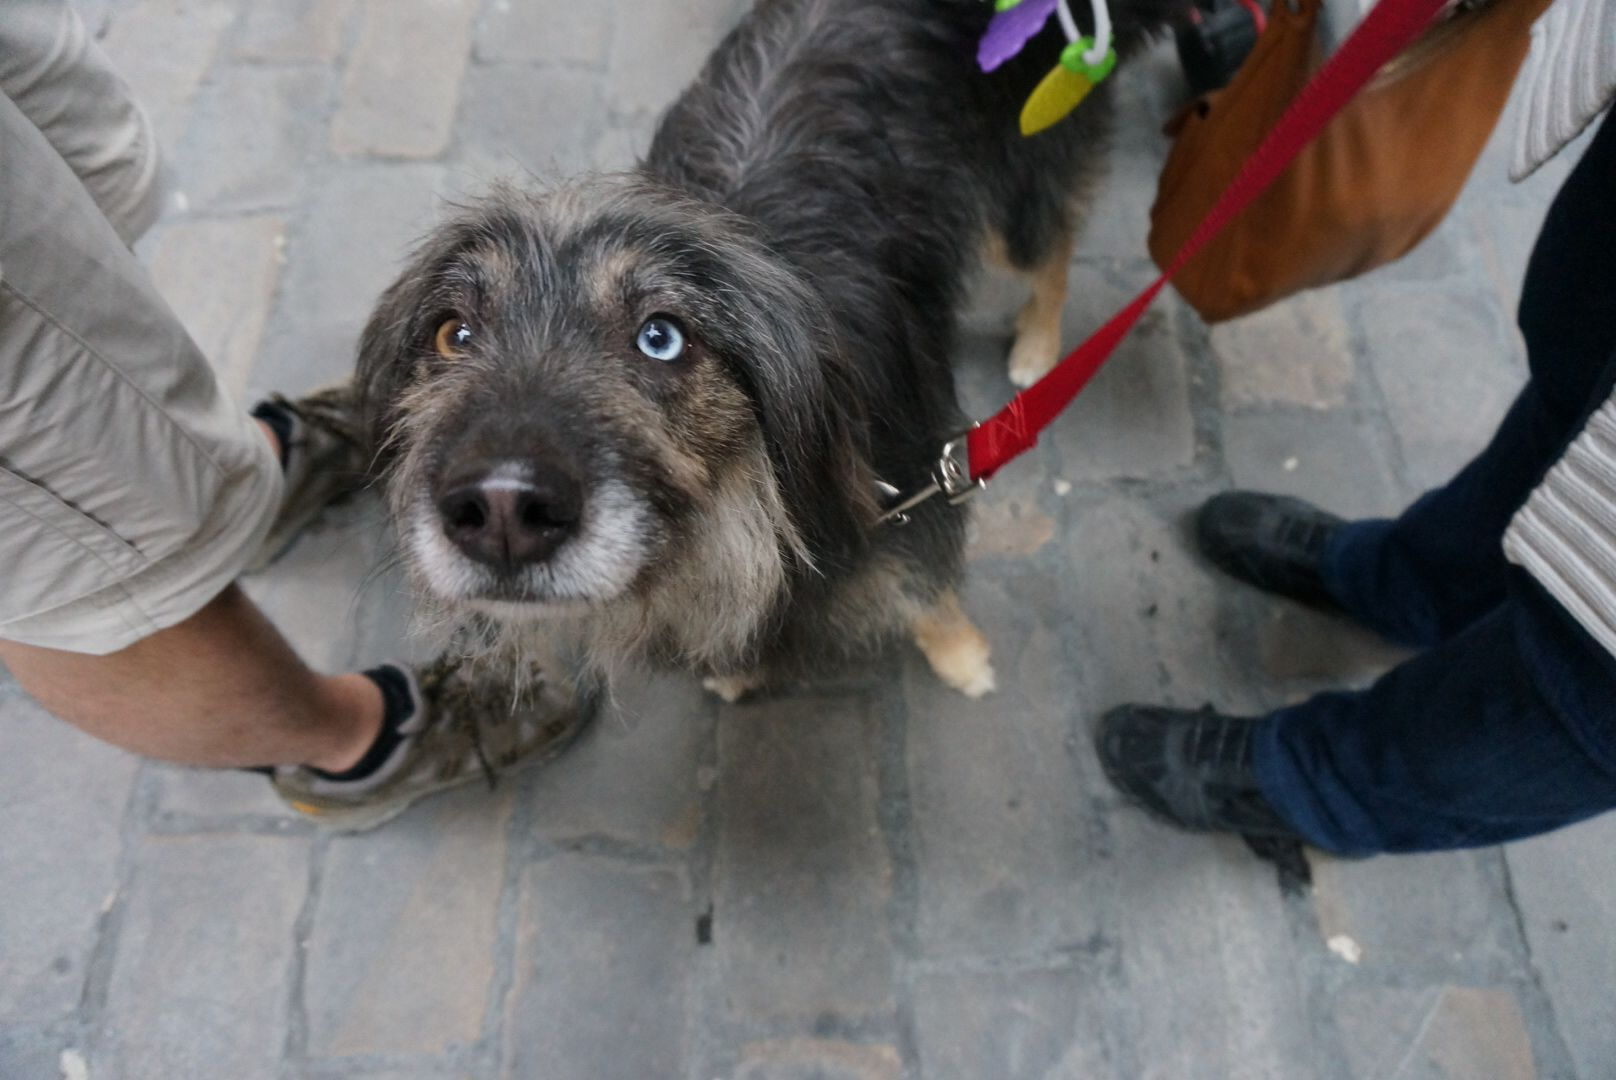 Spain Pamploña.. 까미노에서 처음 만난 도시... 까미노에서 처음 만난 오드아이 강아지.. #odd eye dog.. Muy bonita~